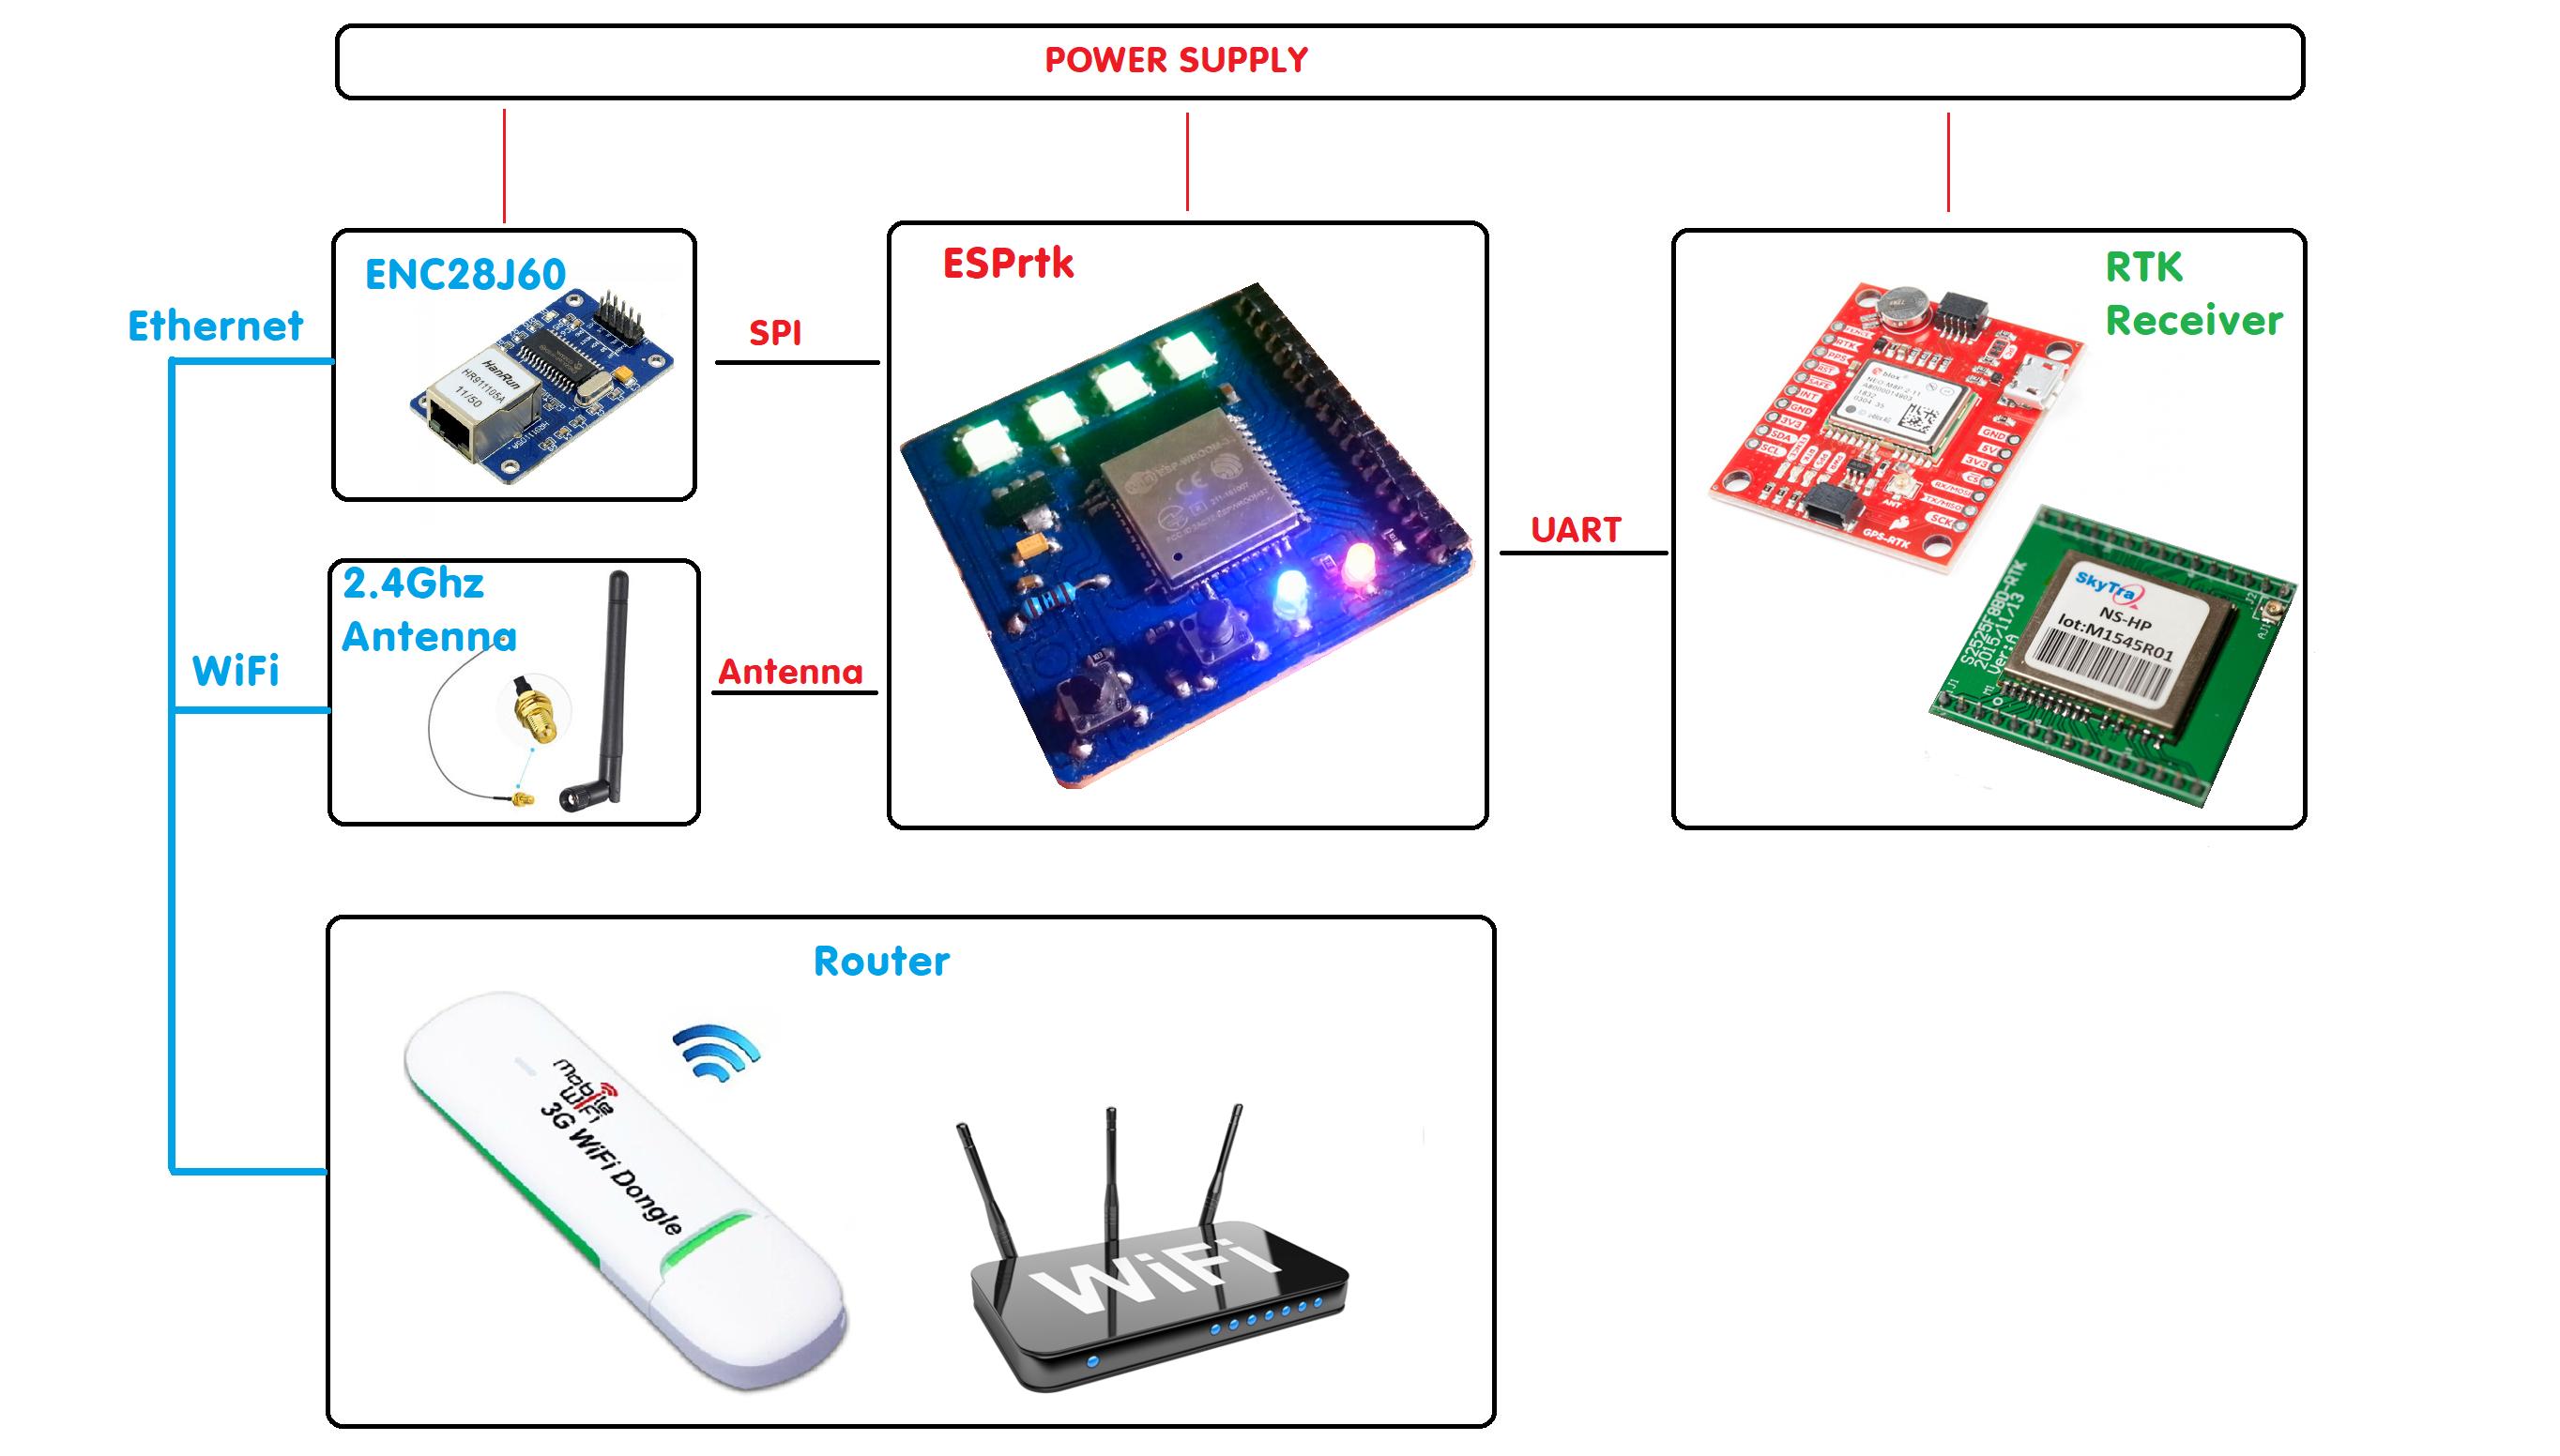 Internet ESPrtk model hardware connect RTK